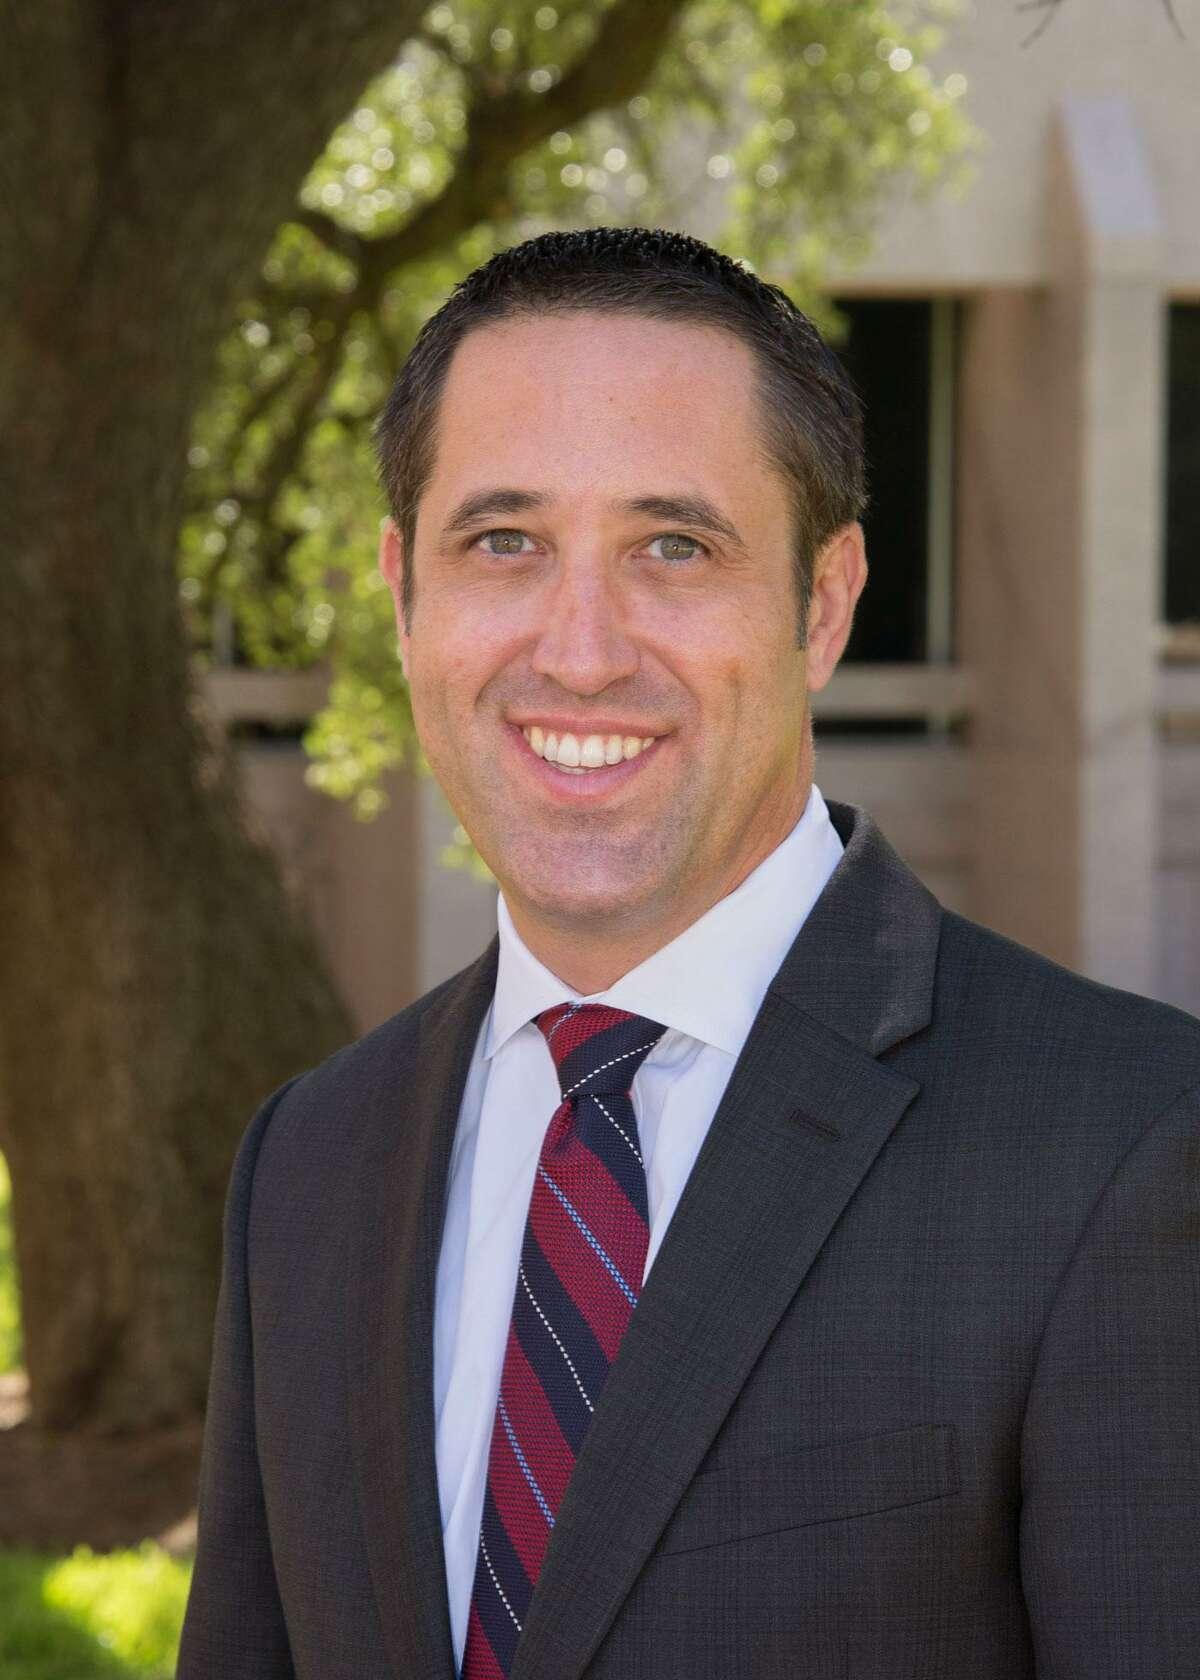 Glenn Hegar, Texas comptroller